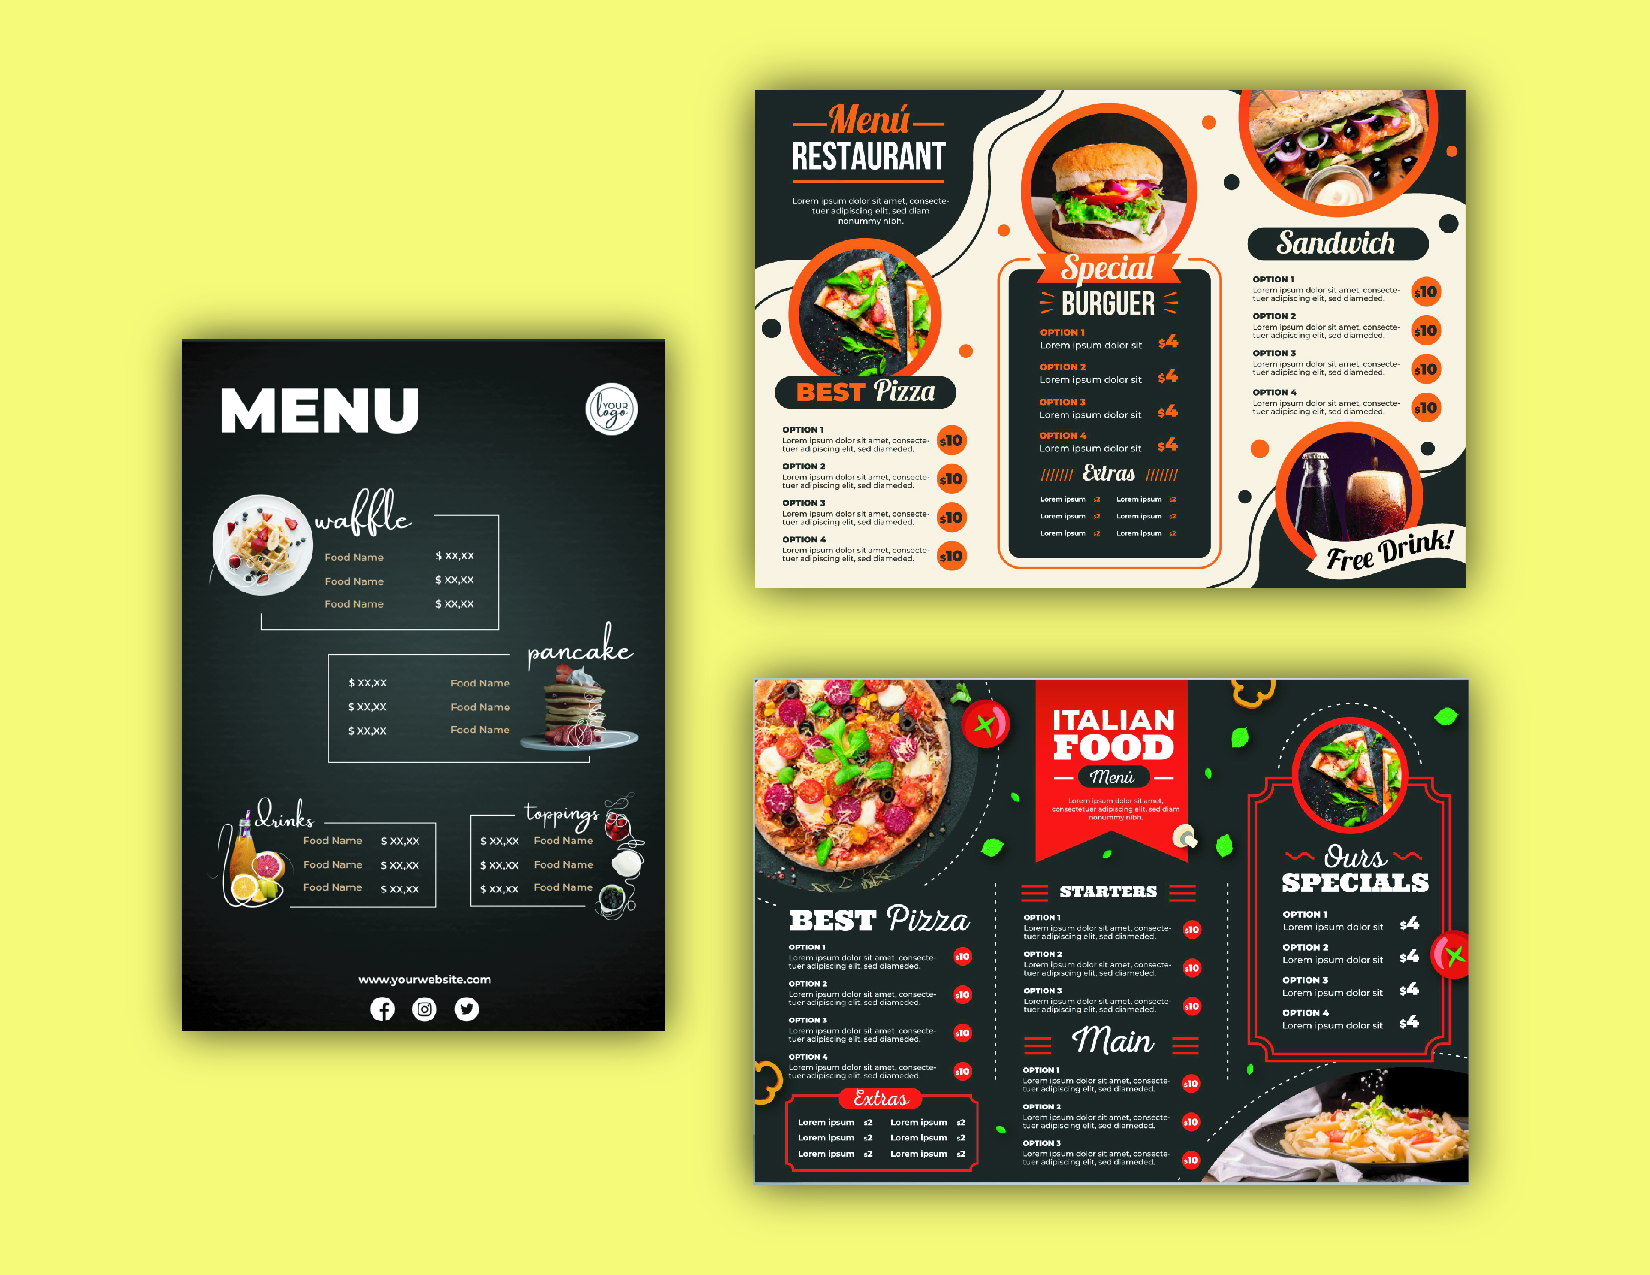 I will provide restaurant menu design or food menu design